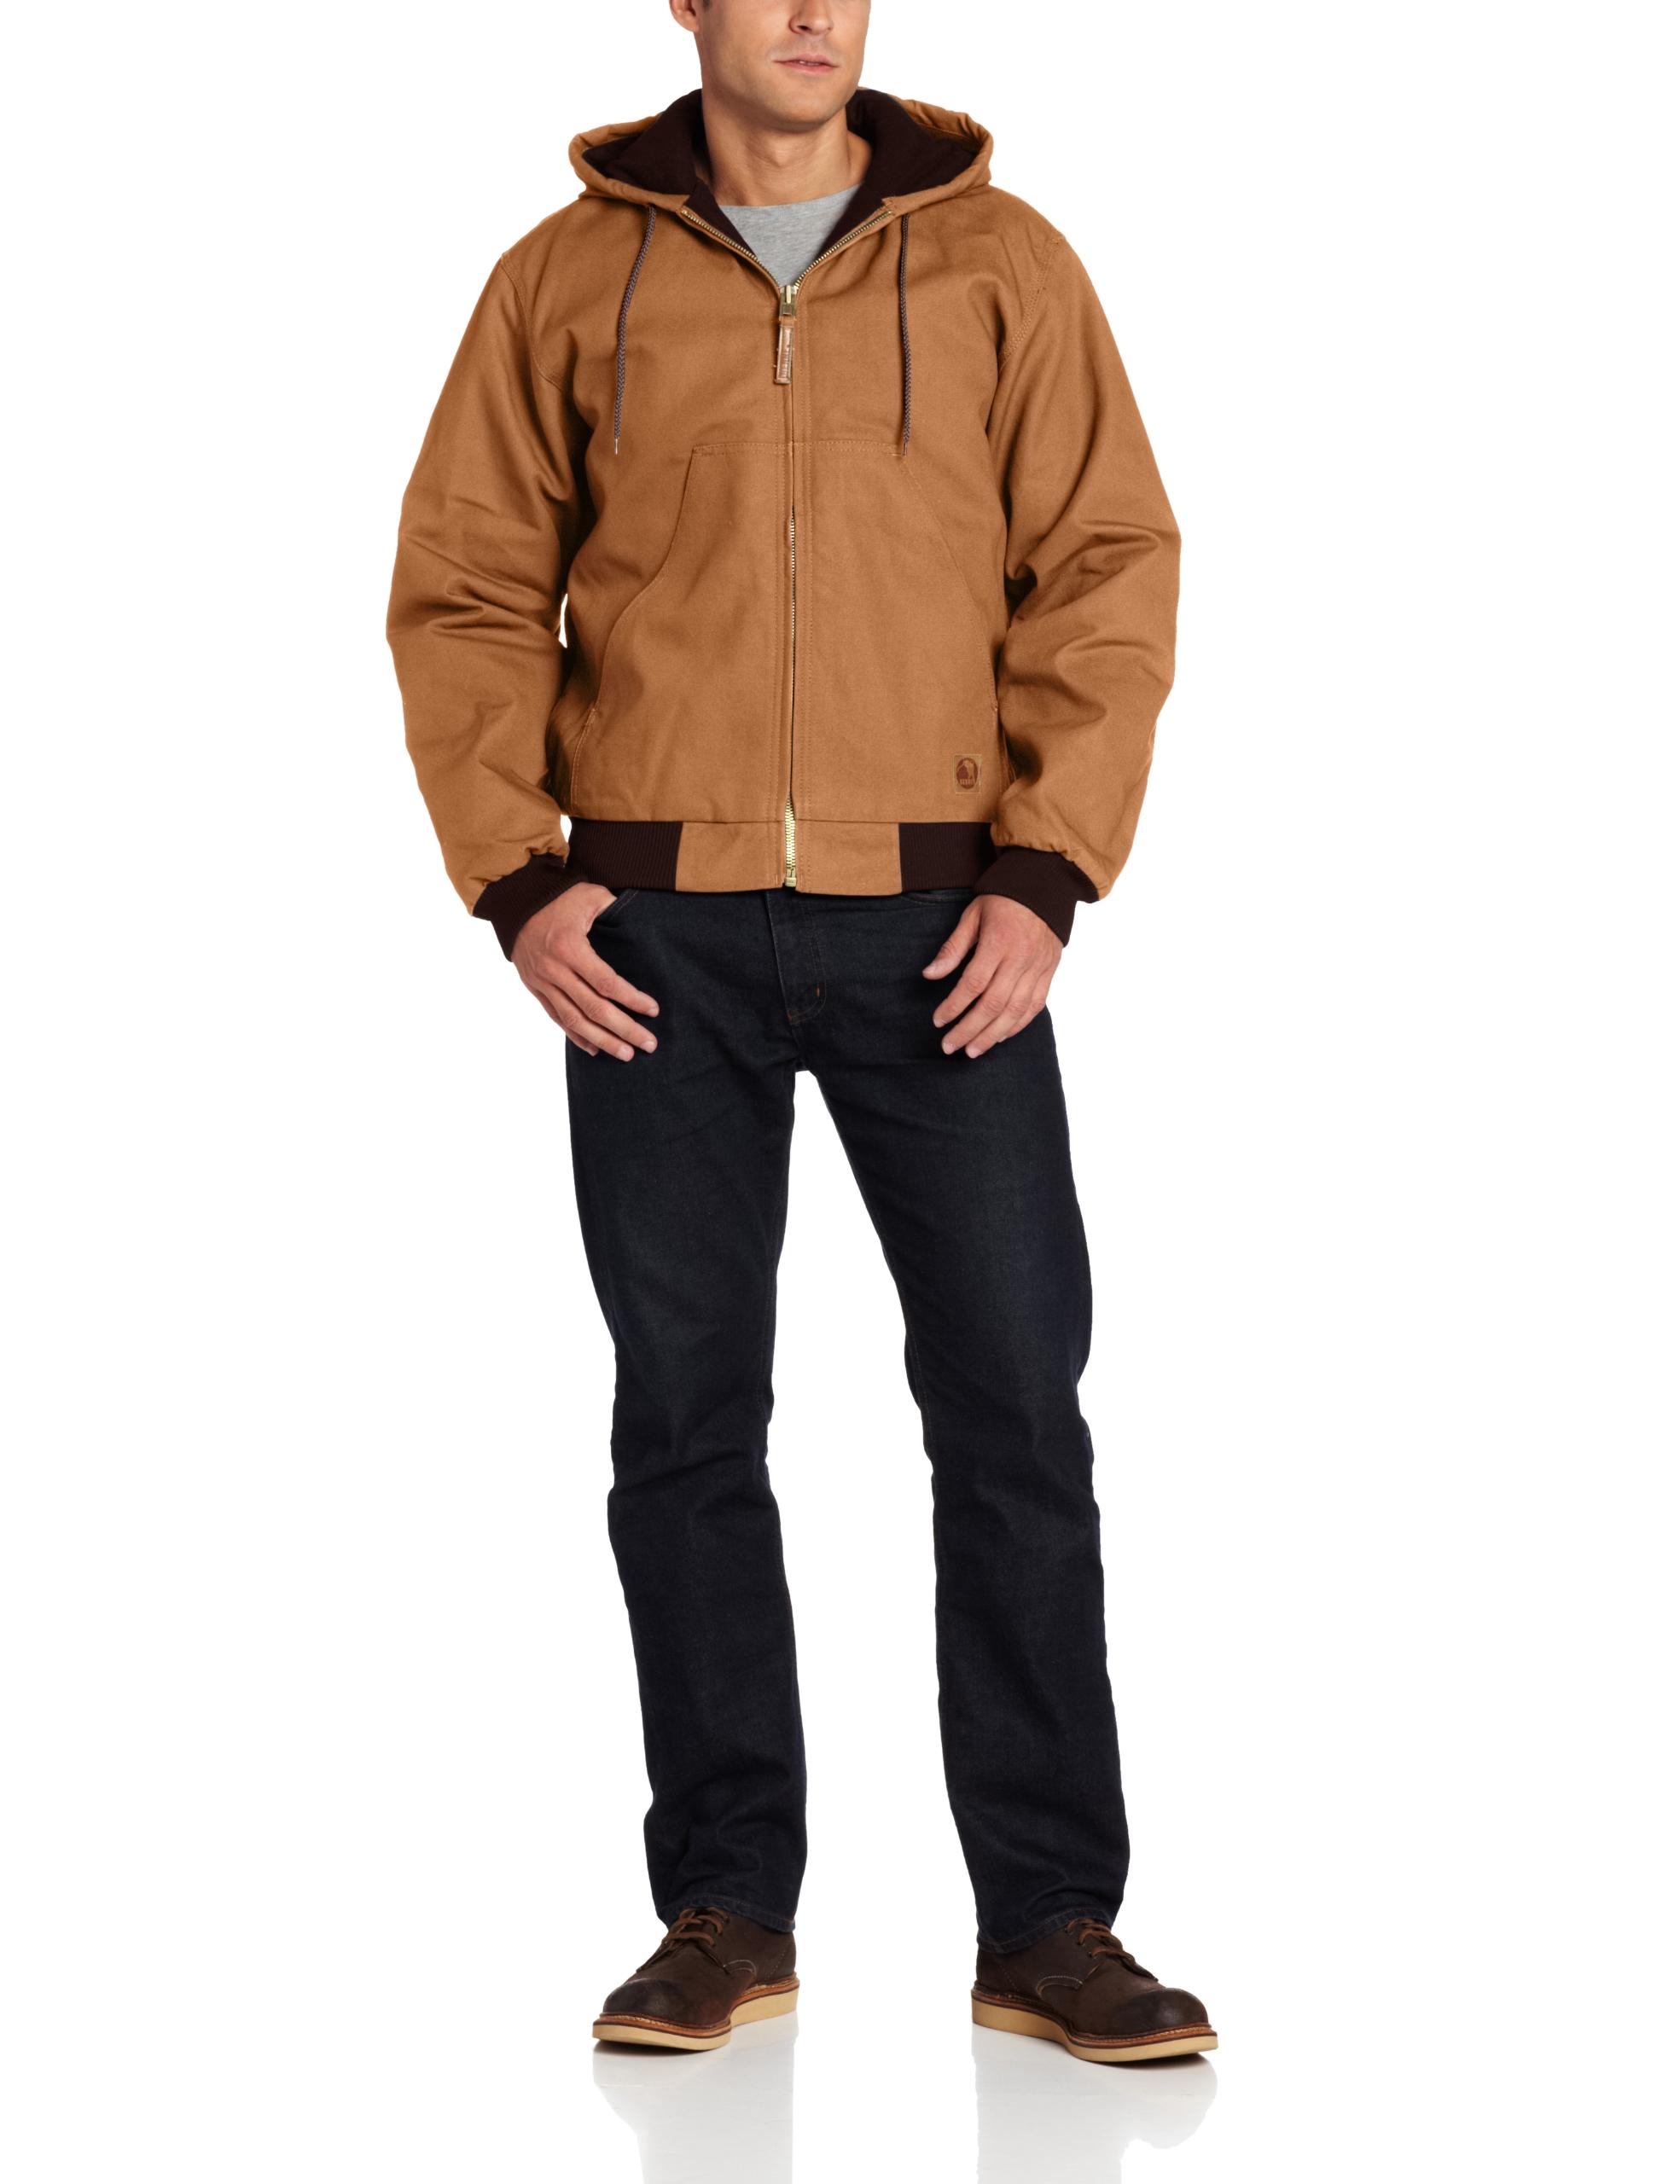 Berne Men's Original Hooded Jacket, Brown, Small/Regular by Berne